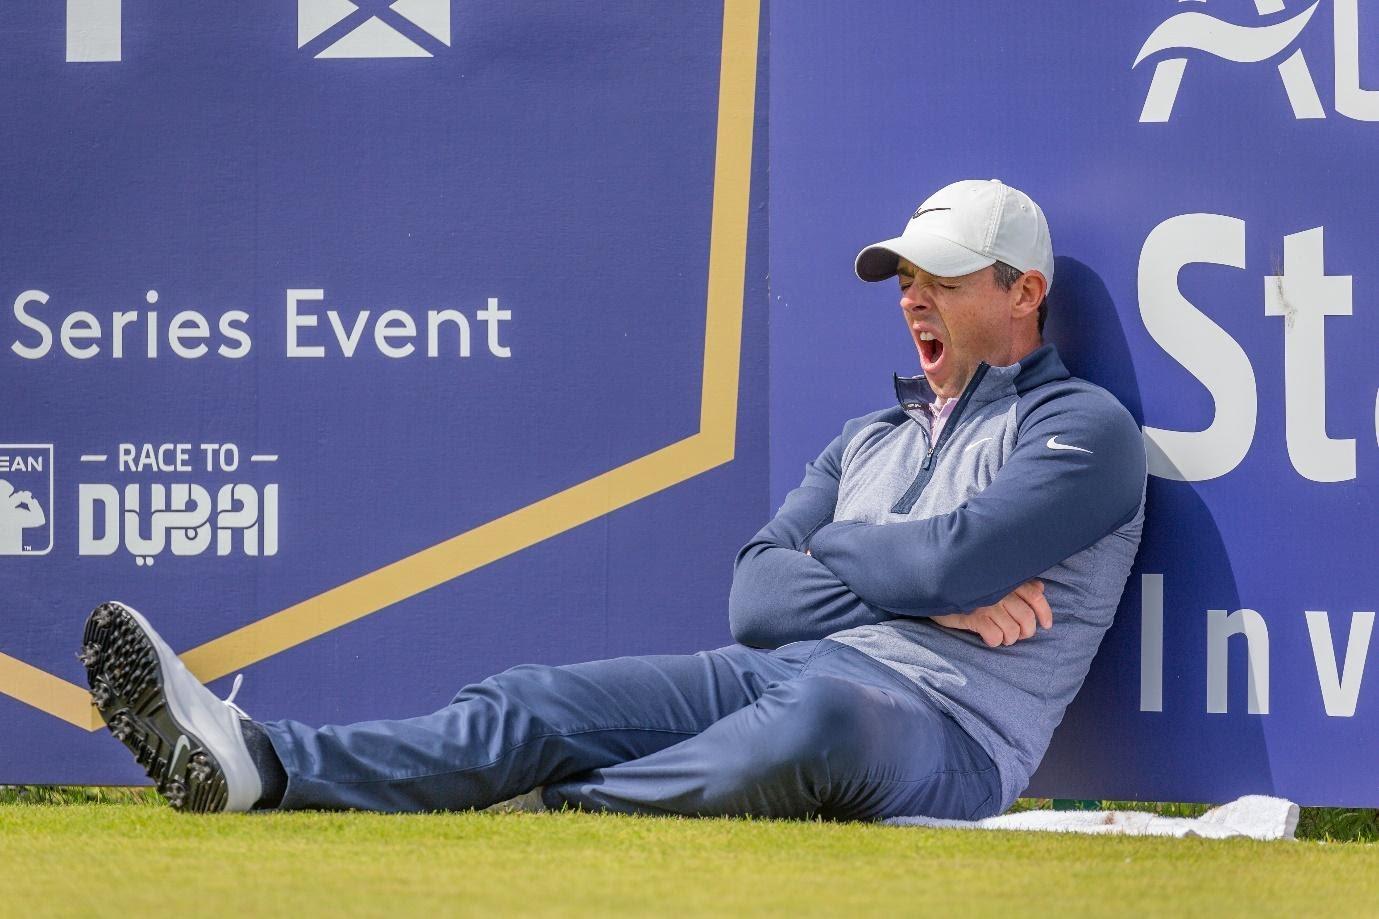 Rory McIlroy aware that he needs to wake up